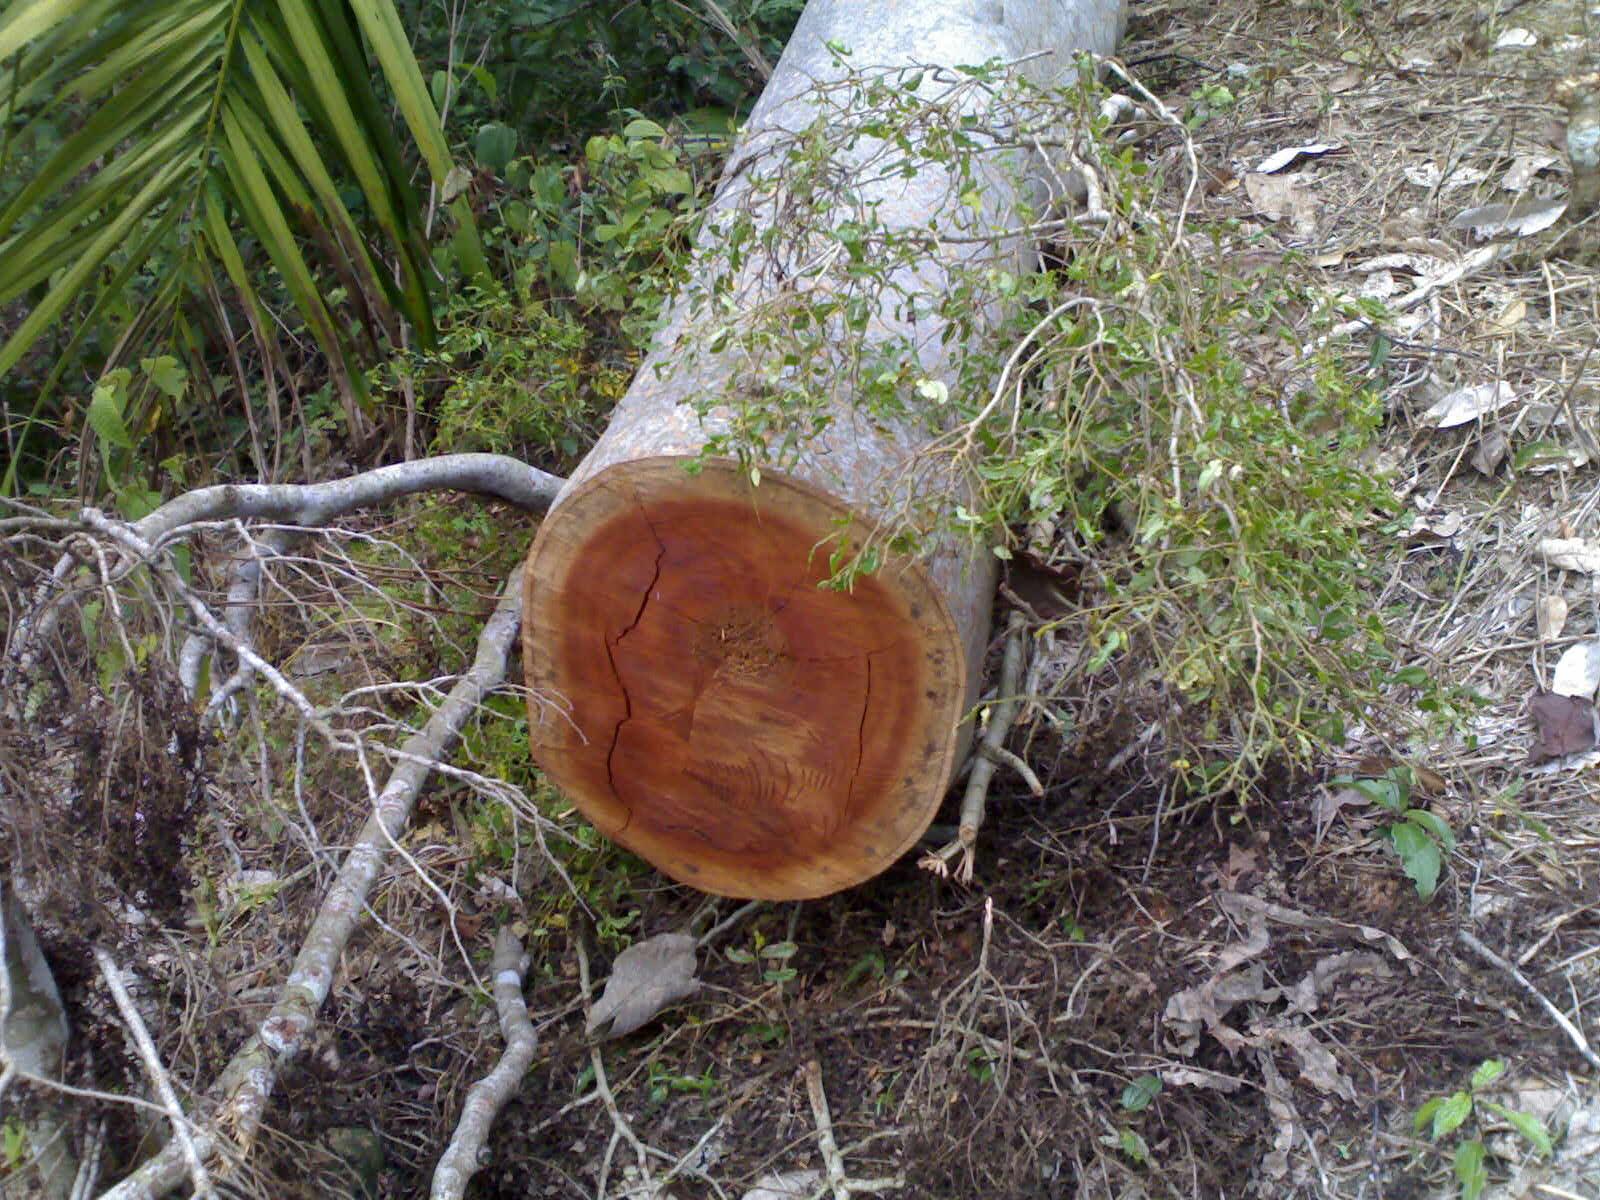 Hutan Lindung Tormatutung di Kabupaten Asahan berubah Fungsi